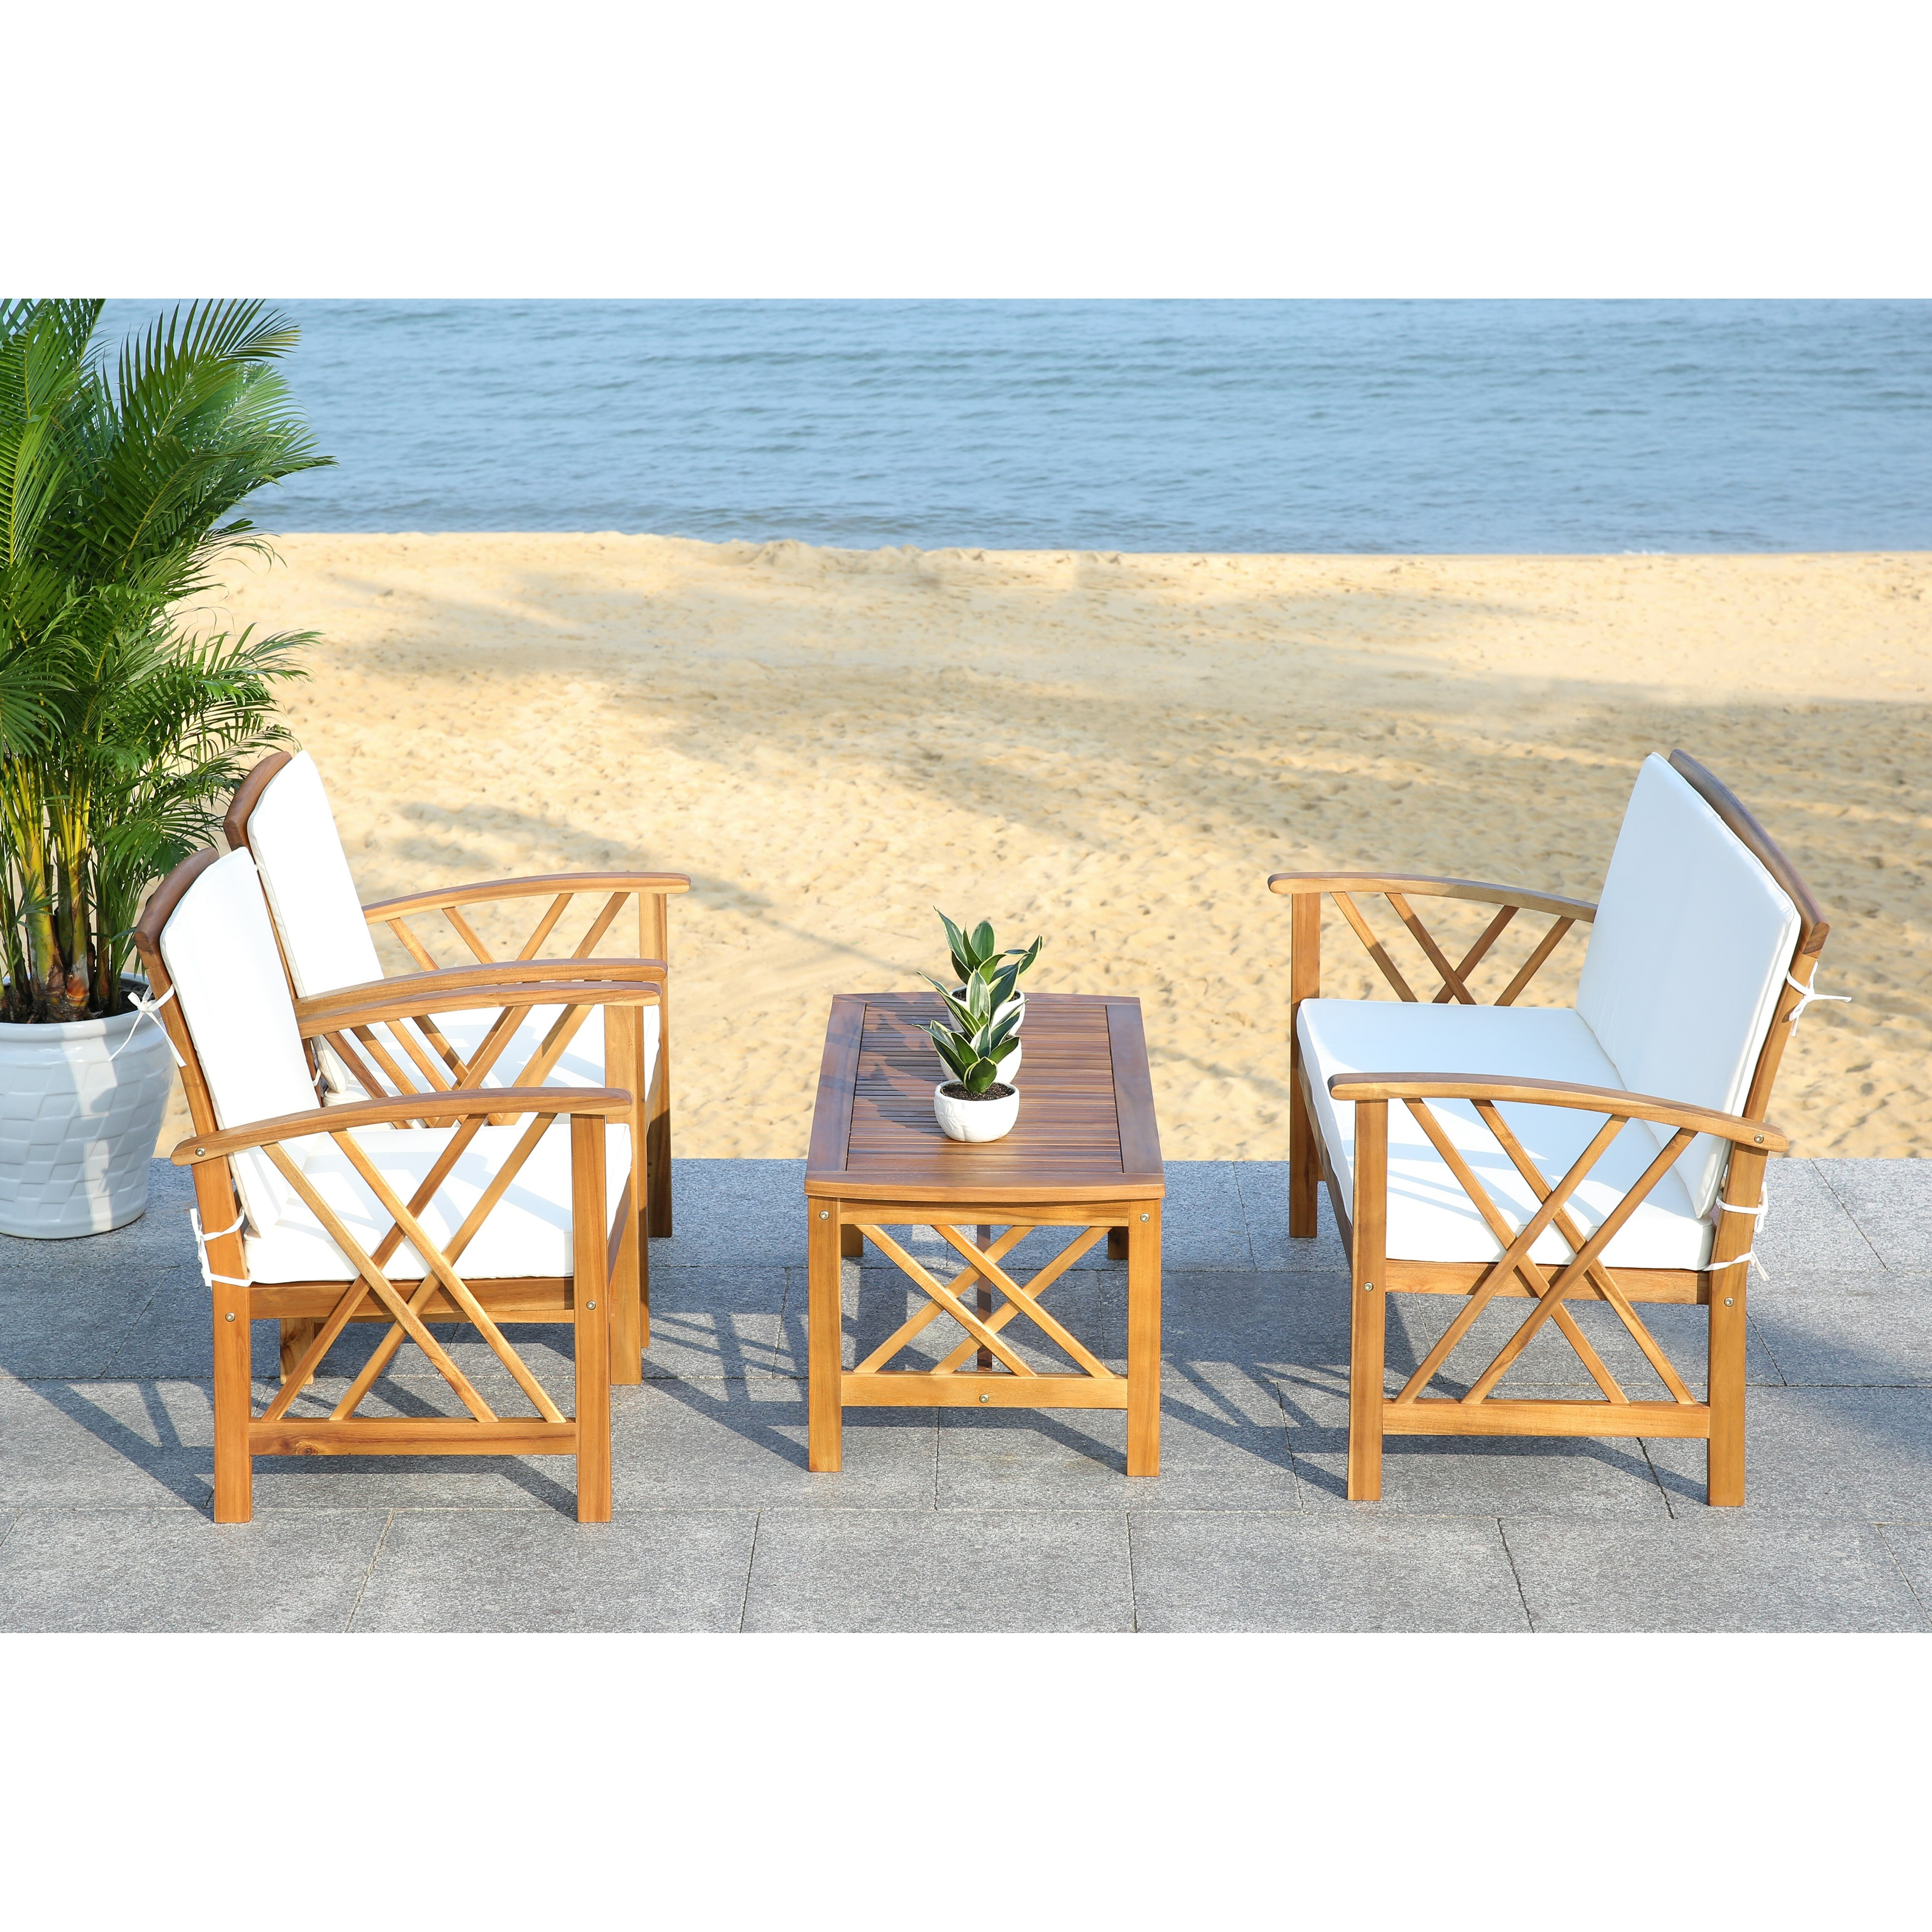 Safavieh Fontana 4 Piece Seating Group with Cushions ... on Safavieh Fontana Patio Set id=24512